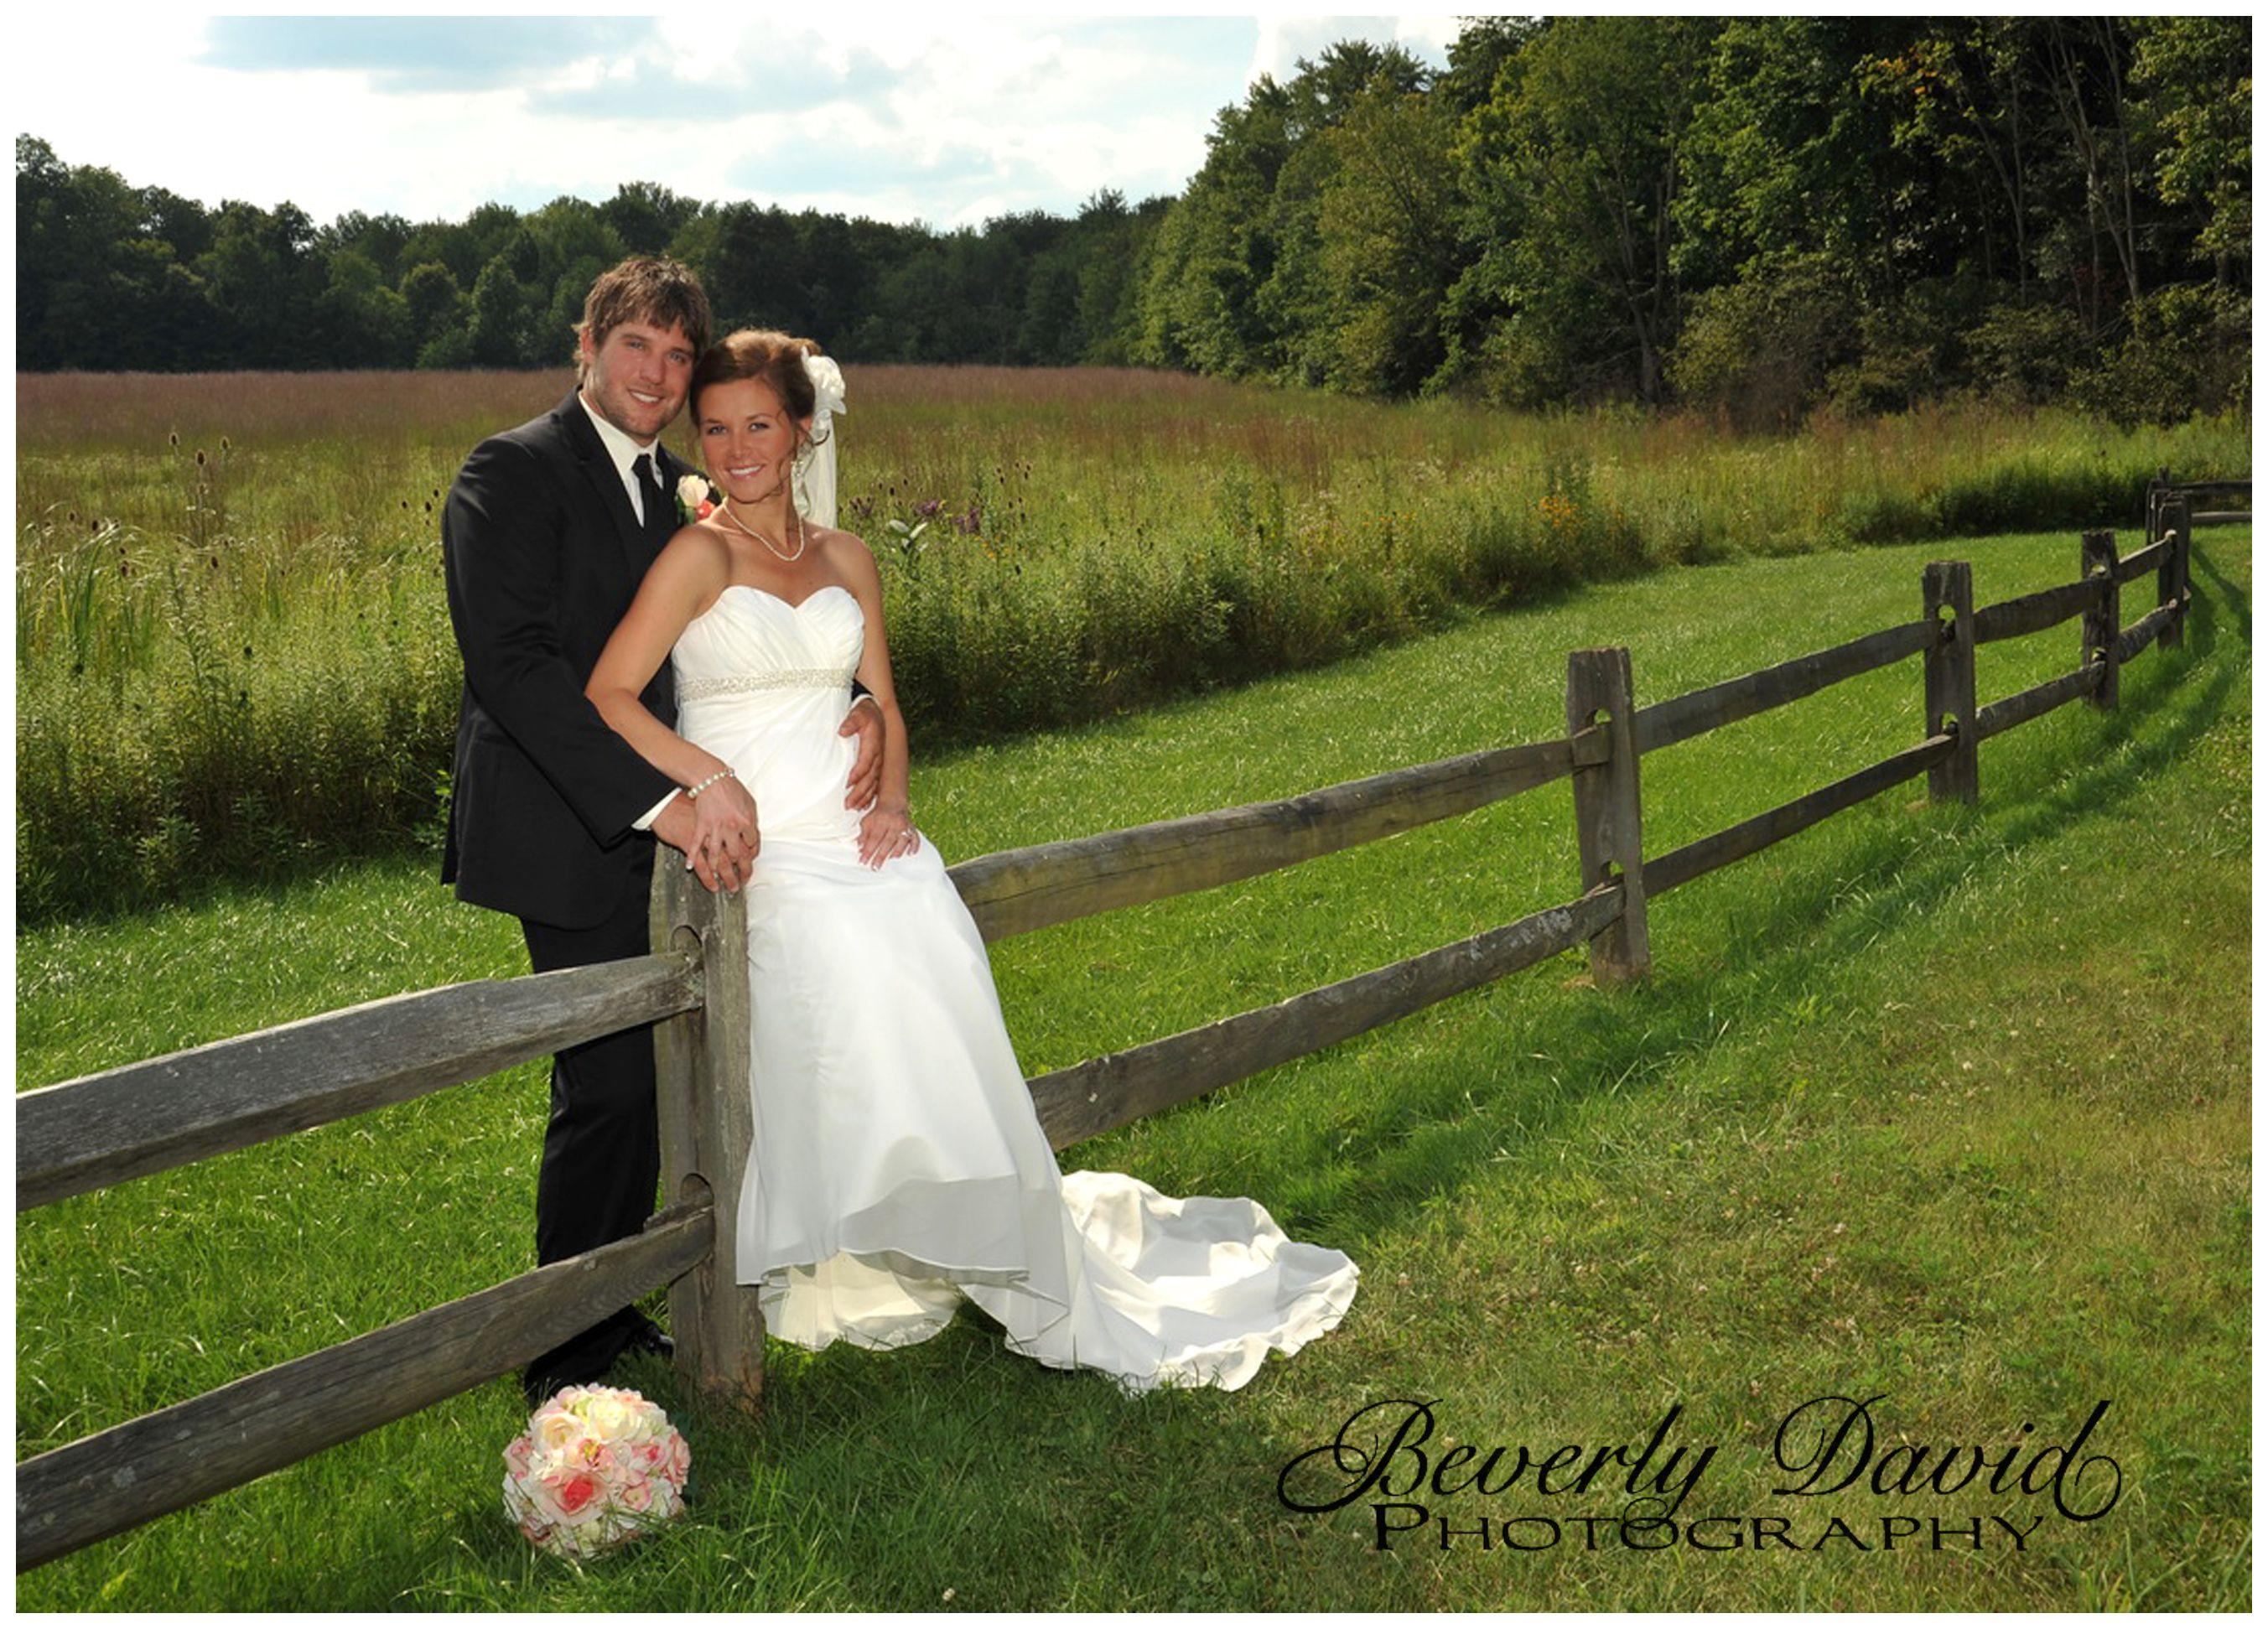 wedding picture locations akron ohio%0A Buzzard Field  Hinckley Reservation  Hinckley  OH beverlydavidphoto com